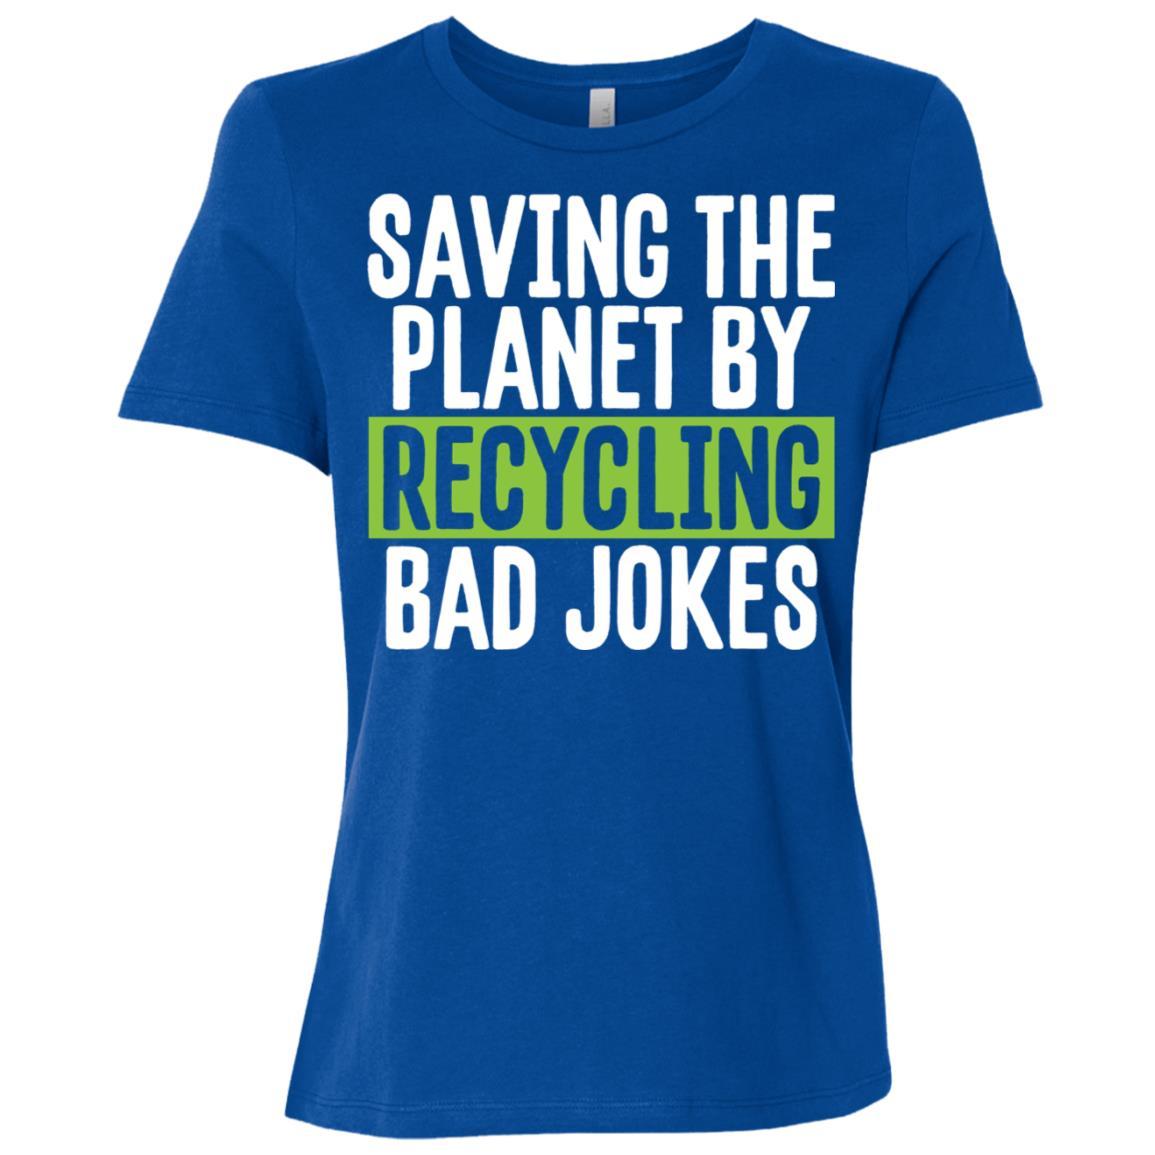 Saving the Planet by Recycling Bad Jokes Eco Pun Women Short Sleeve T-Shirt